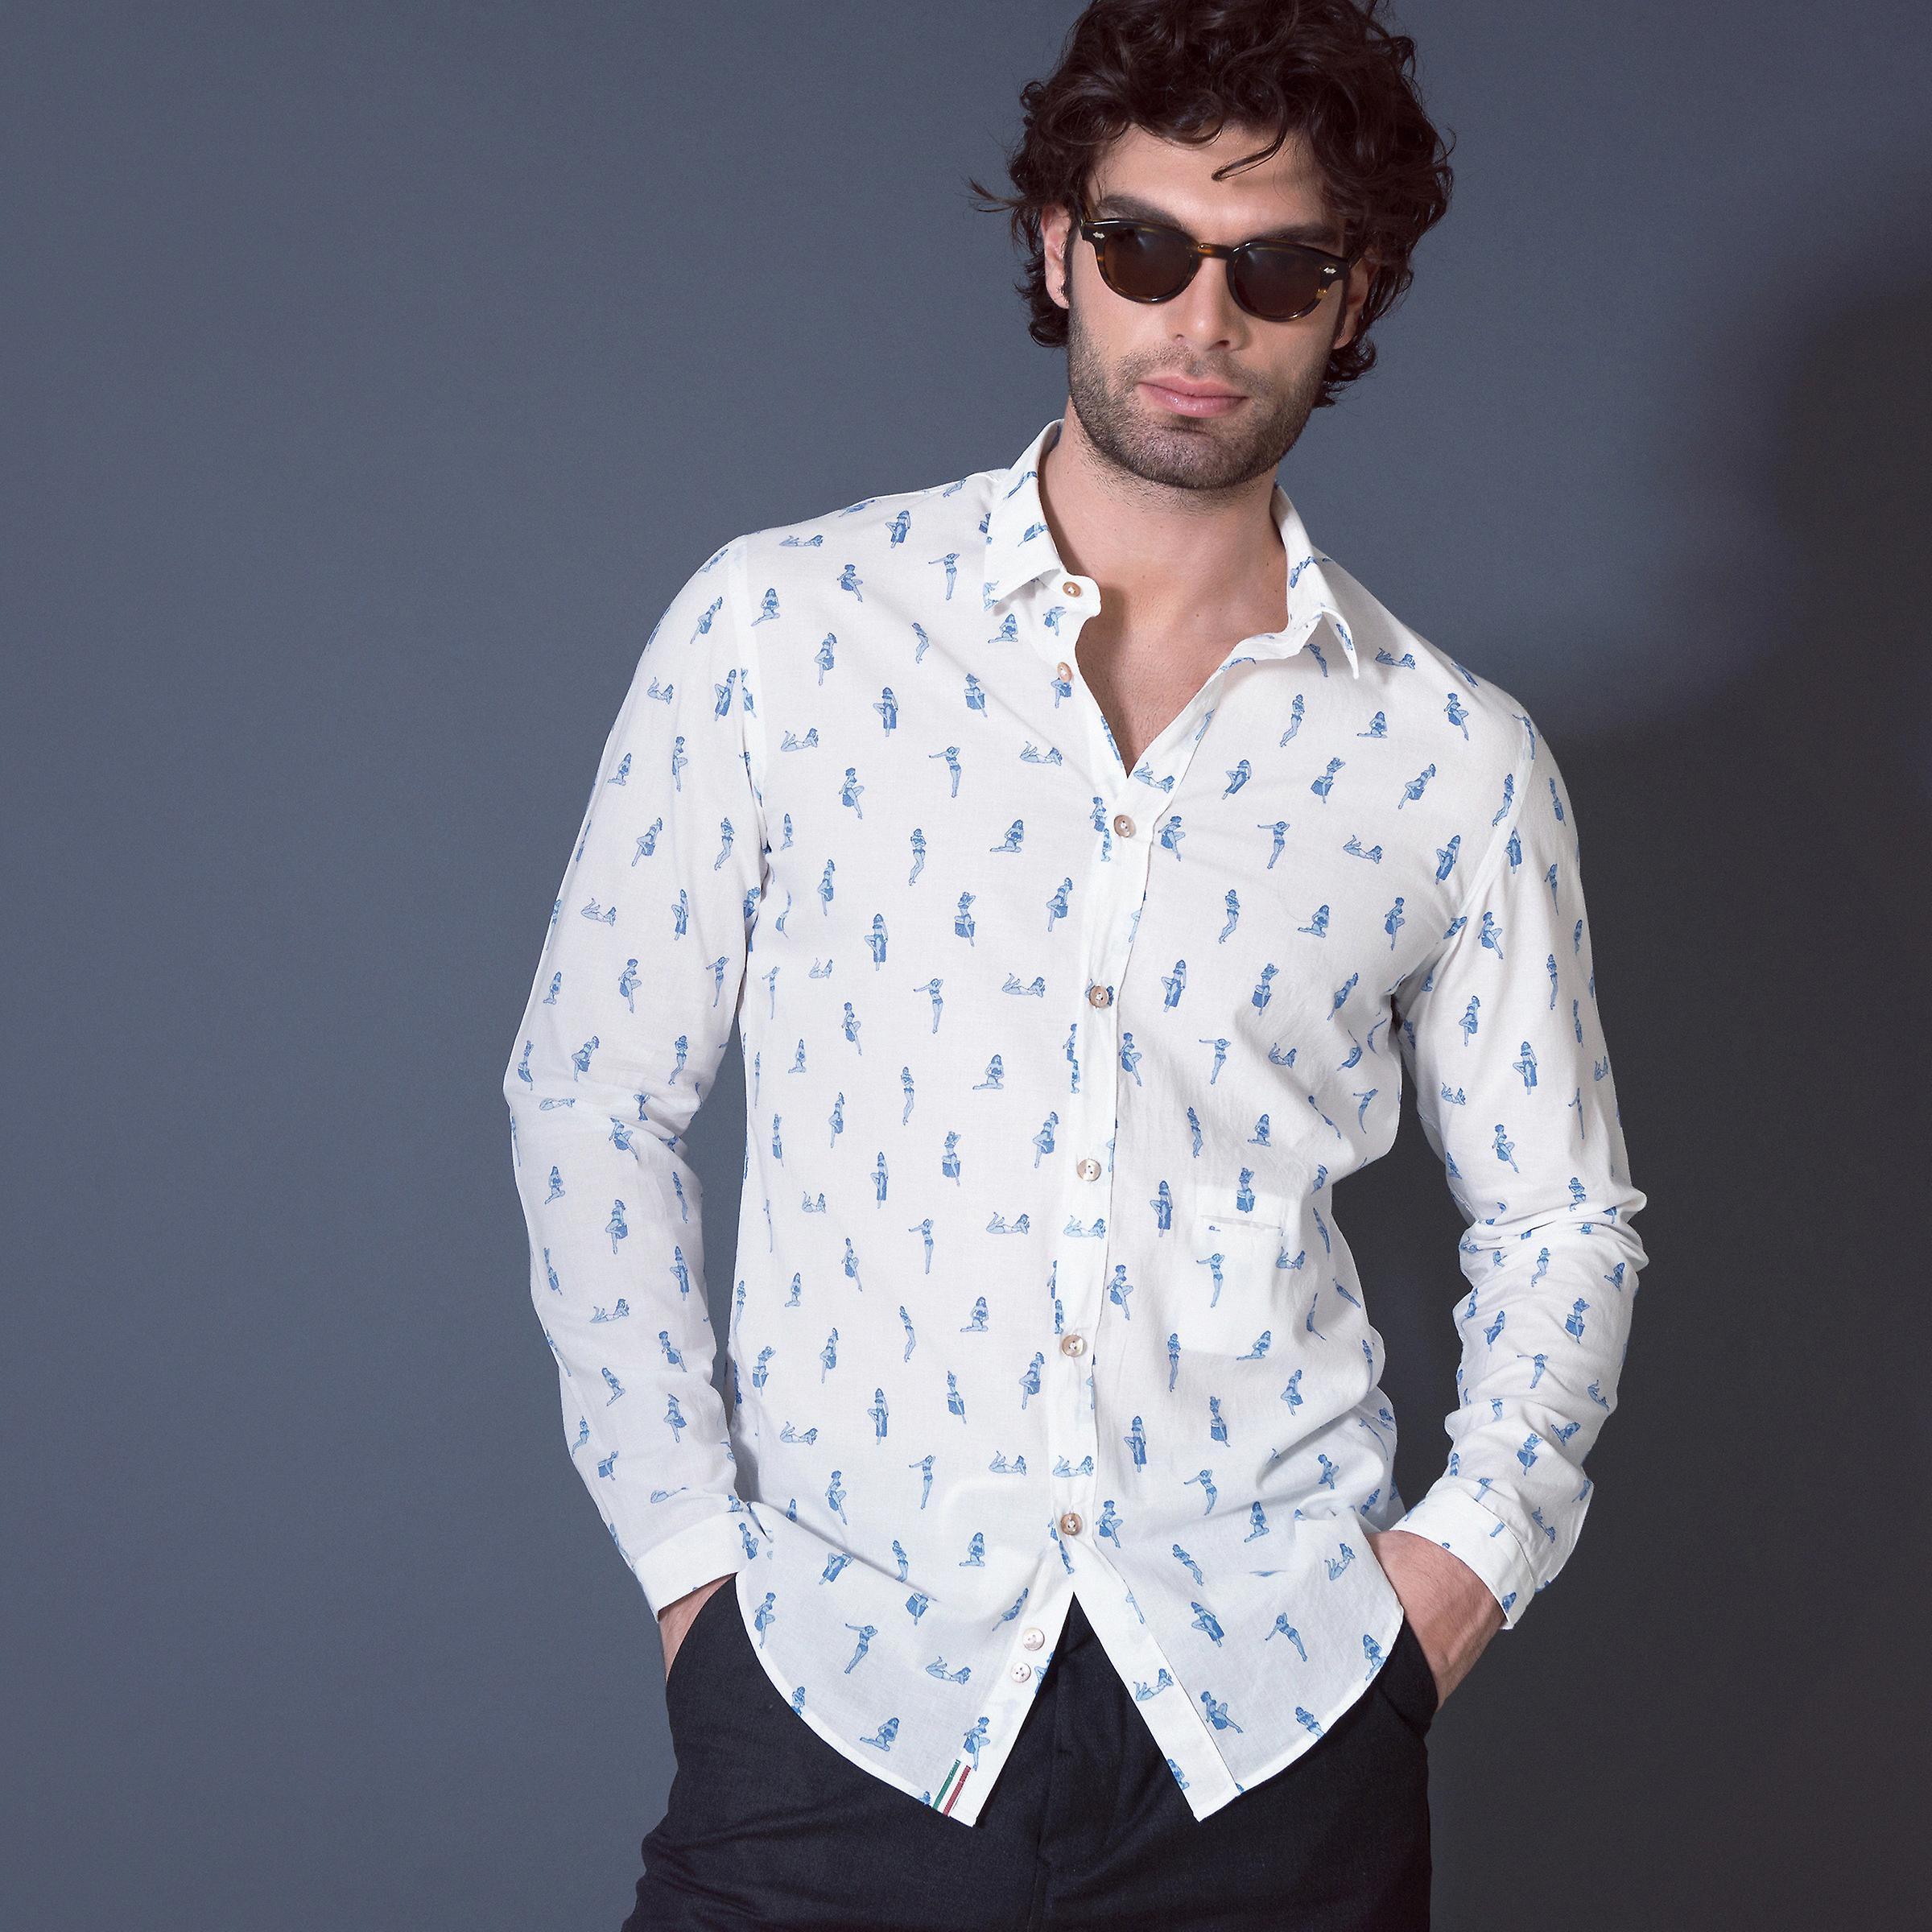 Fabio Giovanni Sapri Shirt - Cheeky Pin-up Print - High Quality Italian Casual Shirt